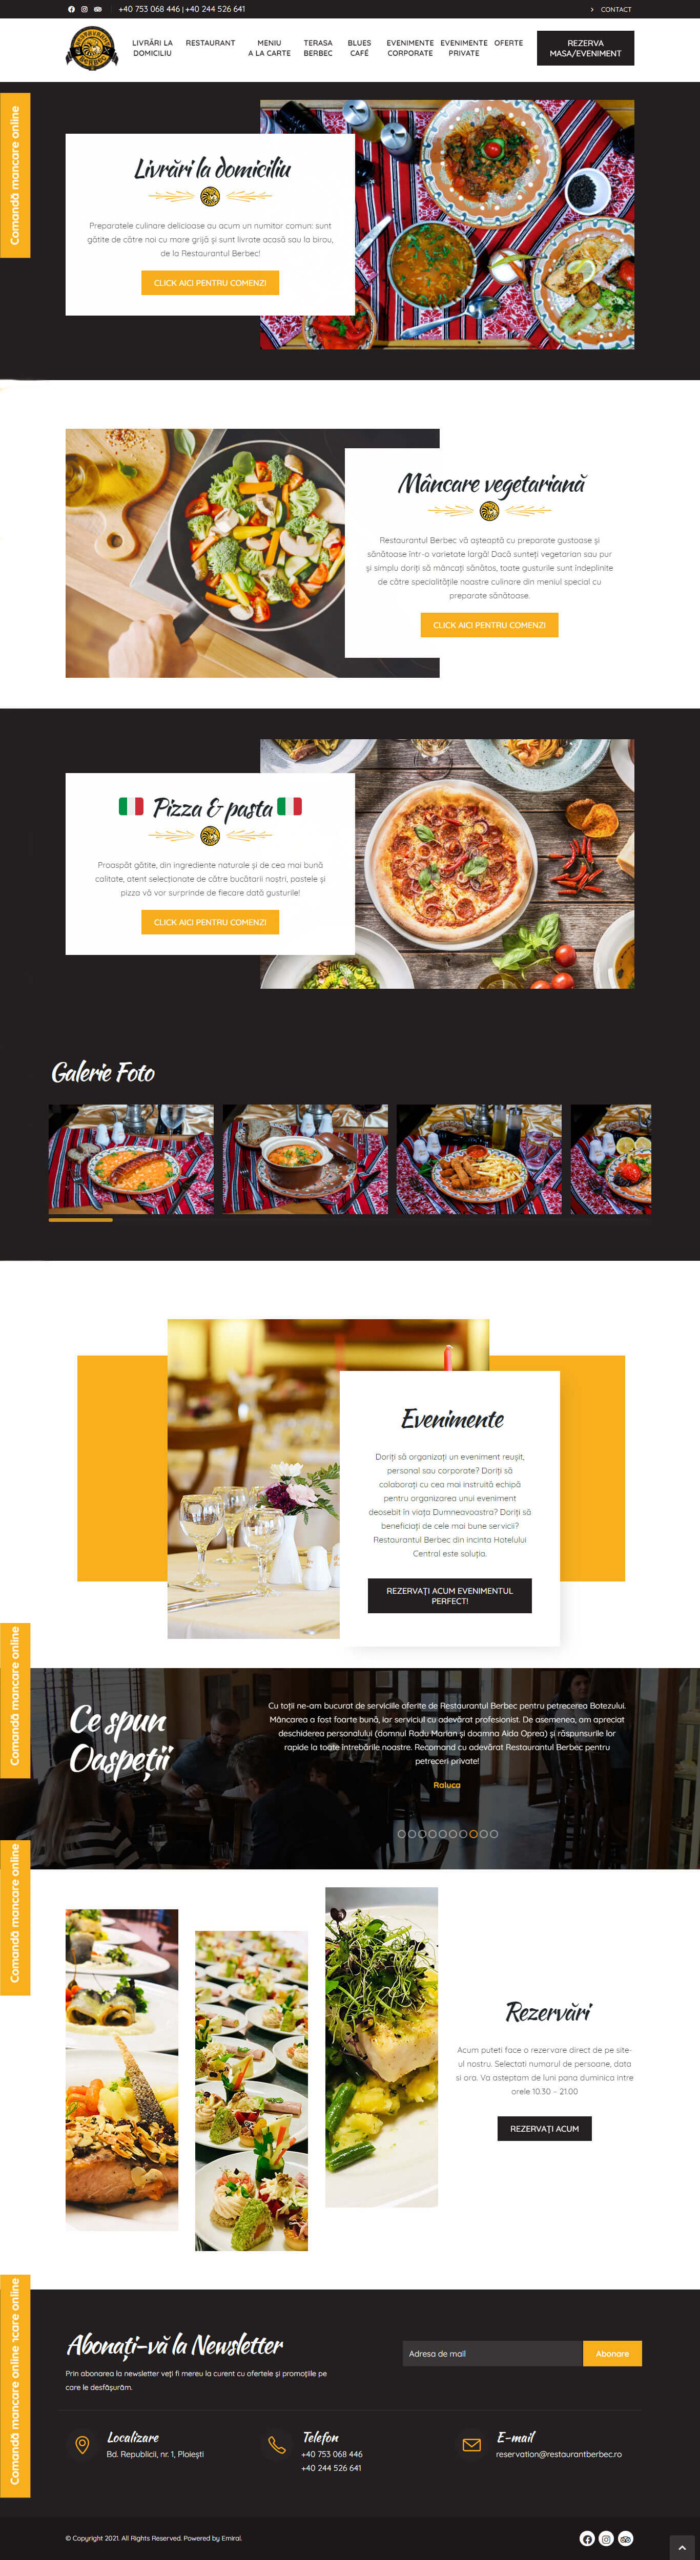 Website Restaurant Berbec